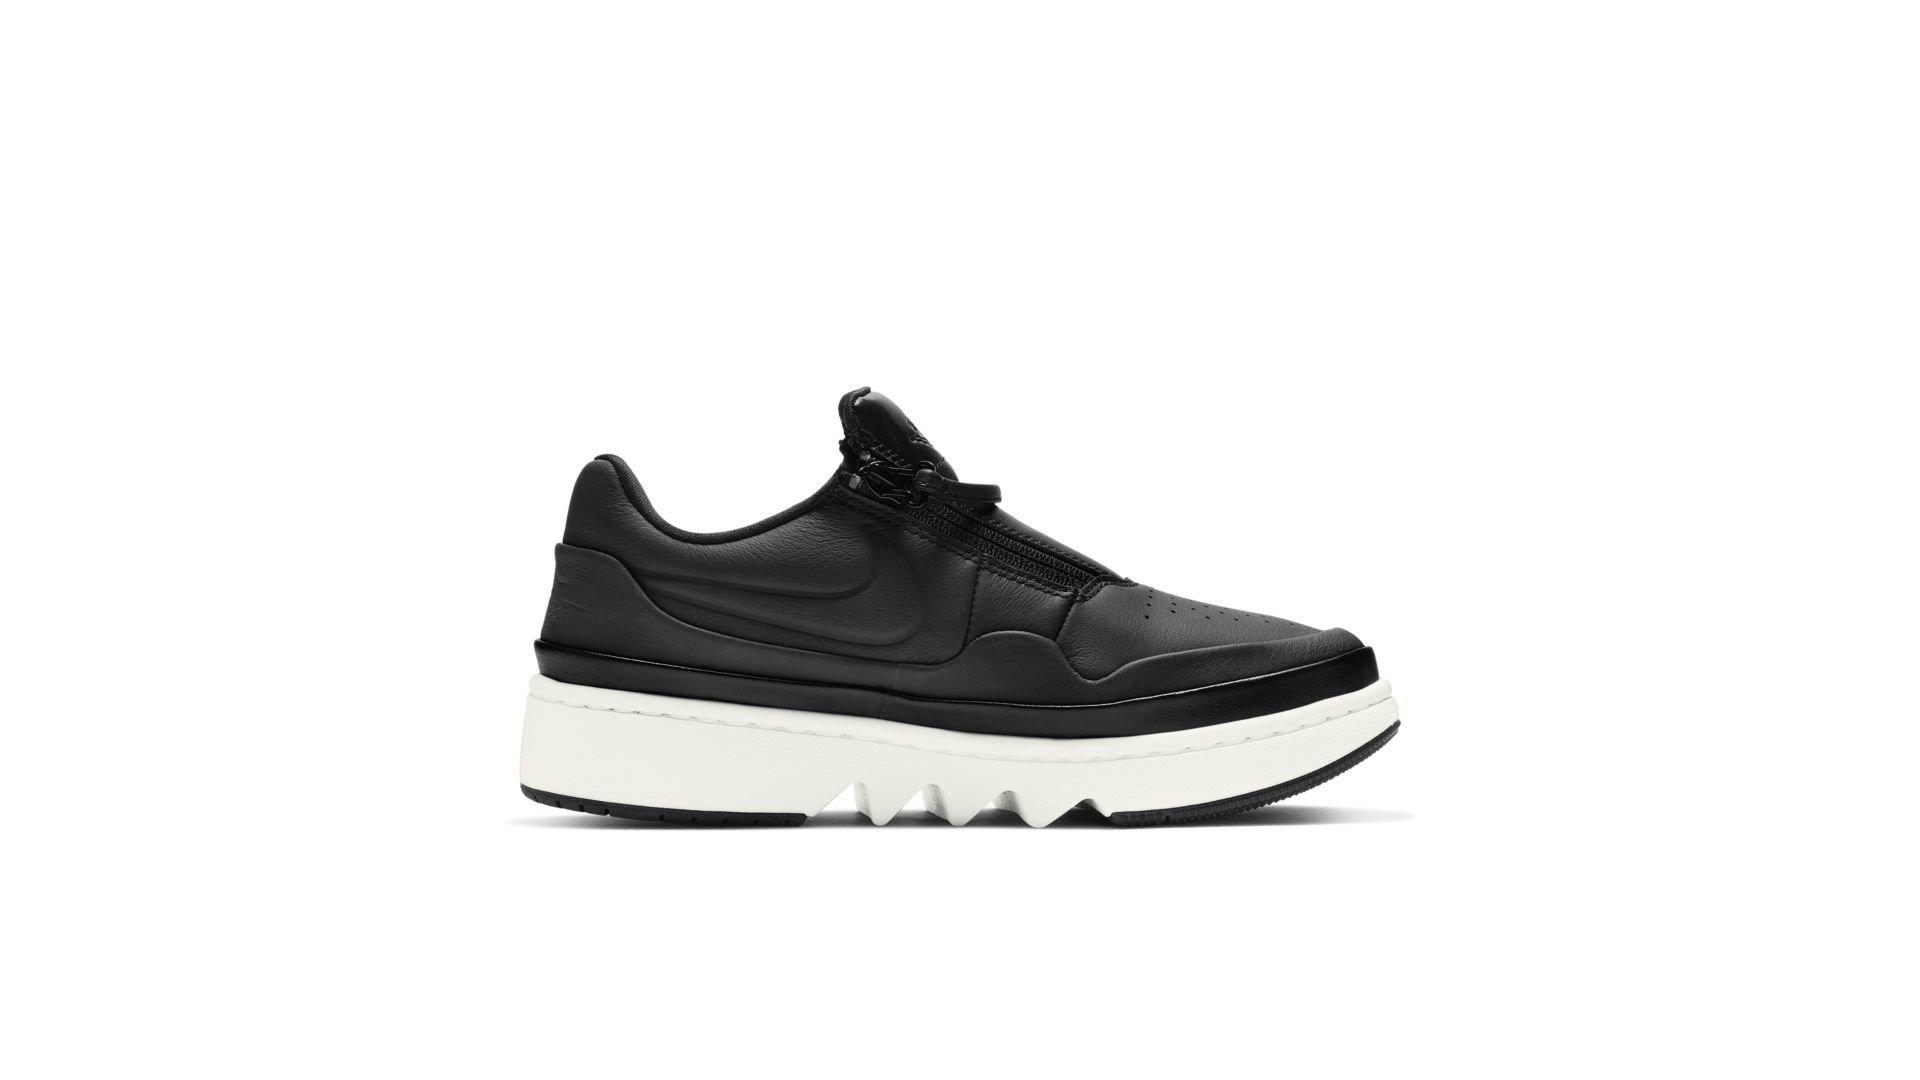 Jordan 1 Jester XX Low Black Sail (W) (AV4050-001)